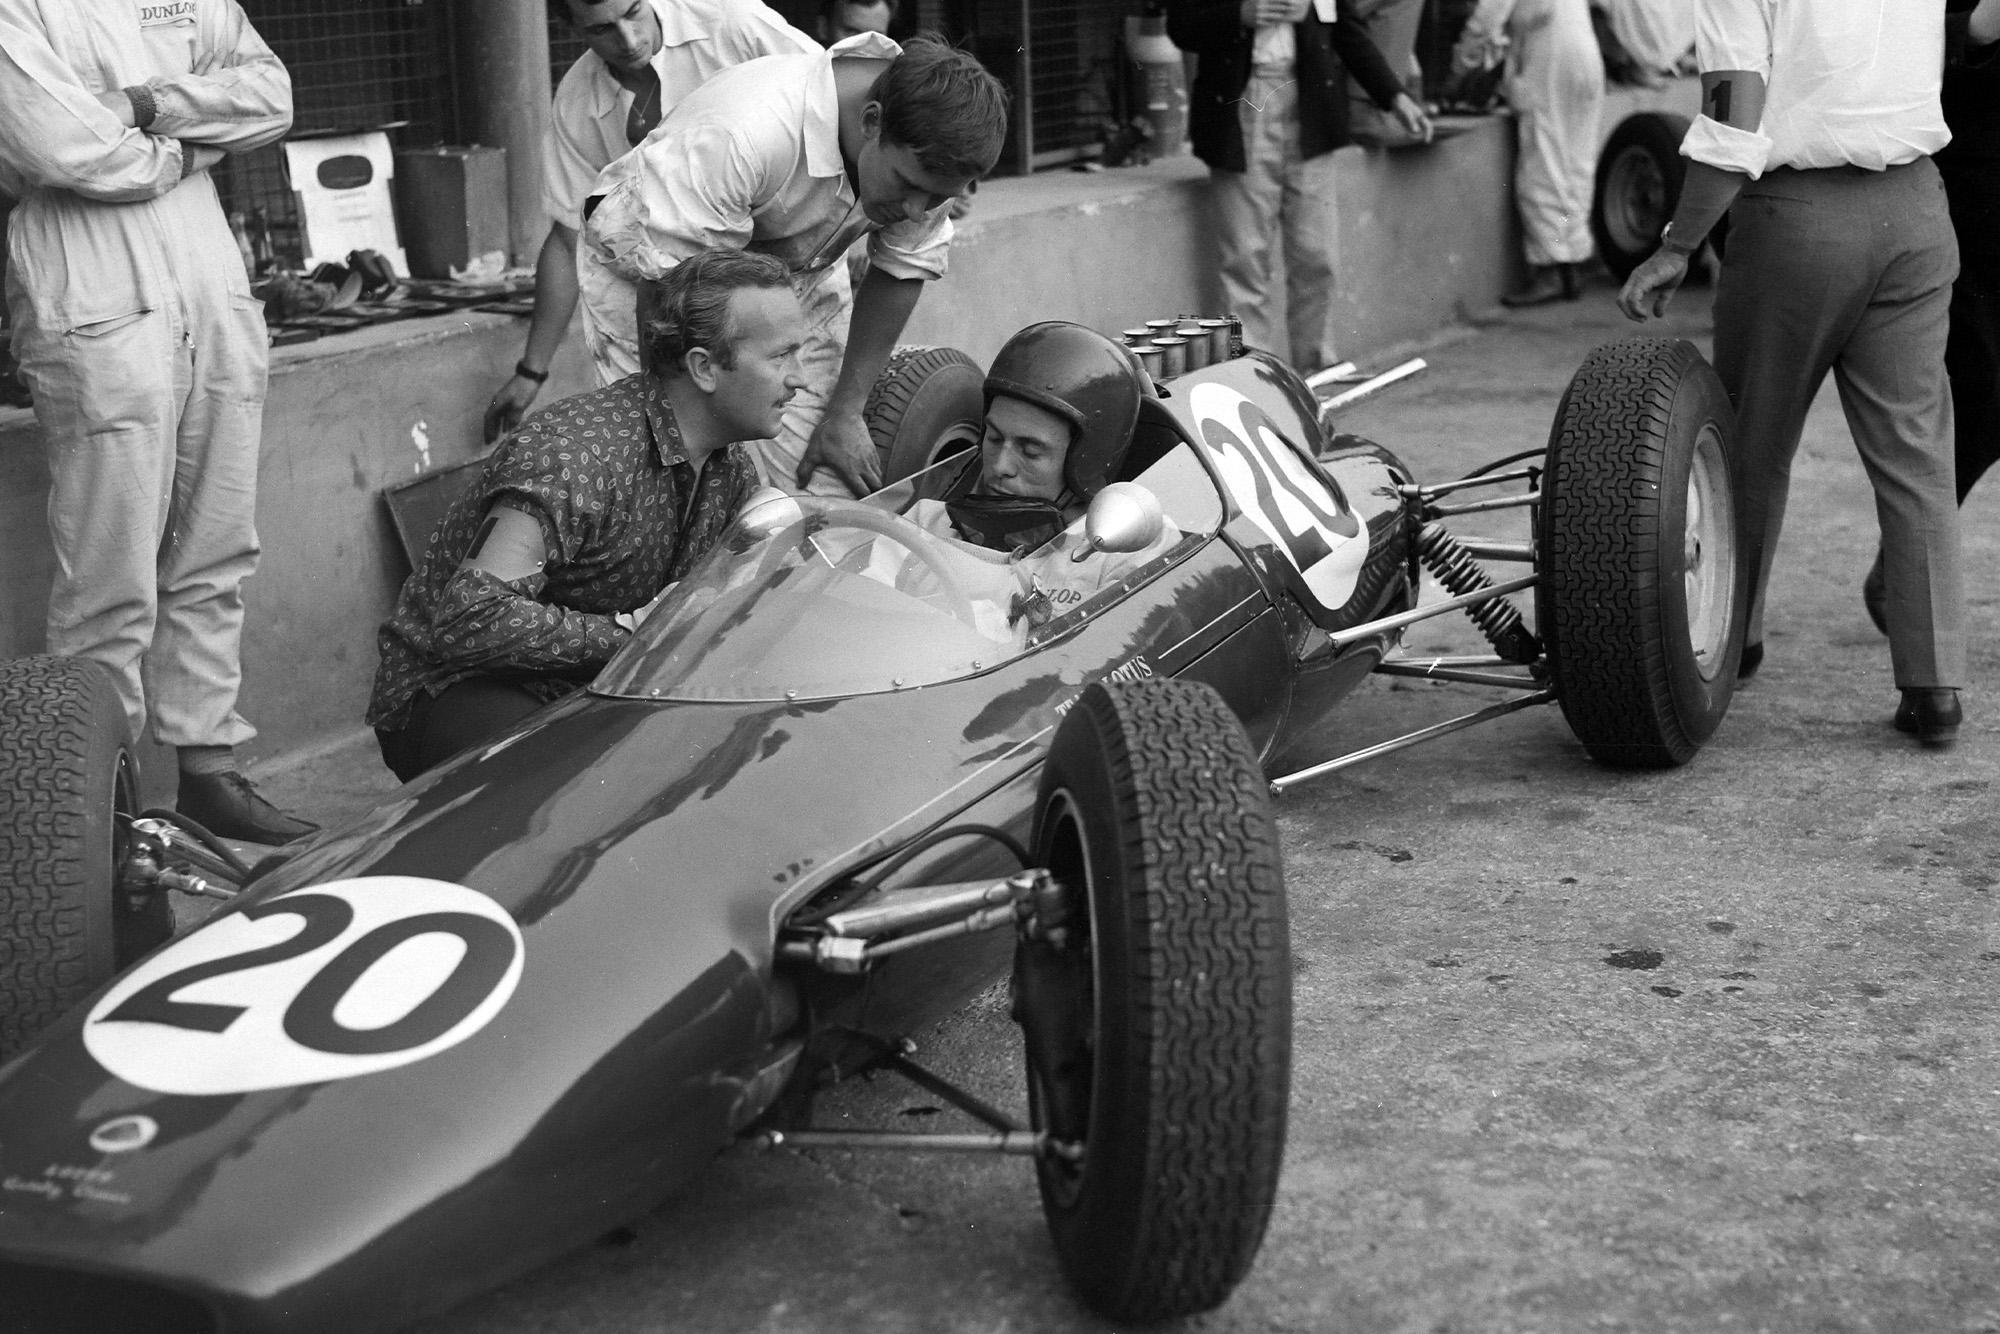 Jim Clark and Colin Chapman converse in the pitlane